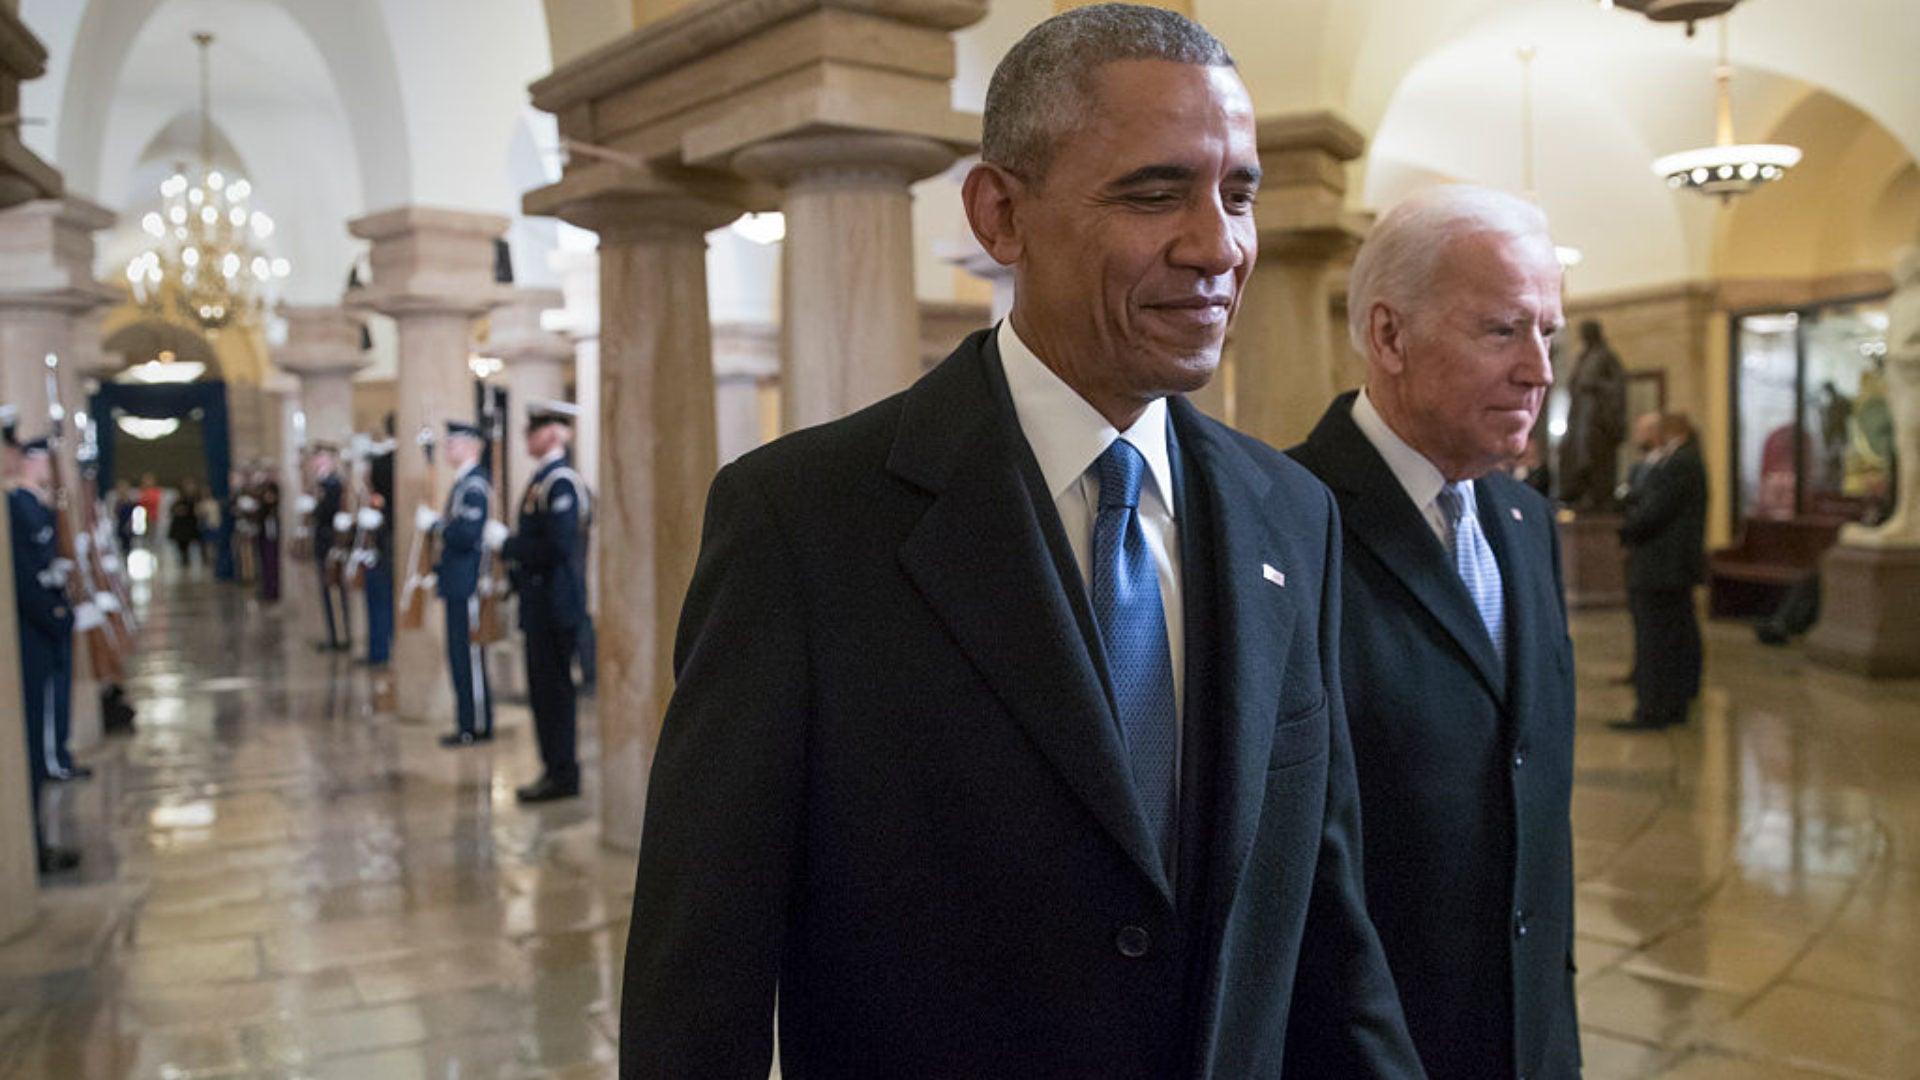 Biden Claims That He Doesn't Need Obama's Endorsement, Buttigieg Stole His Platform